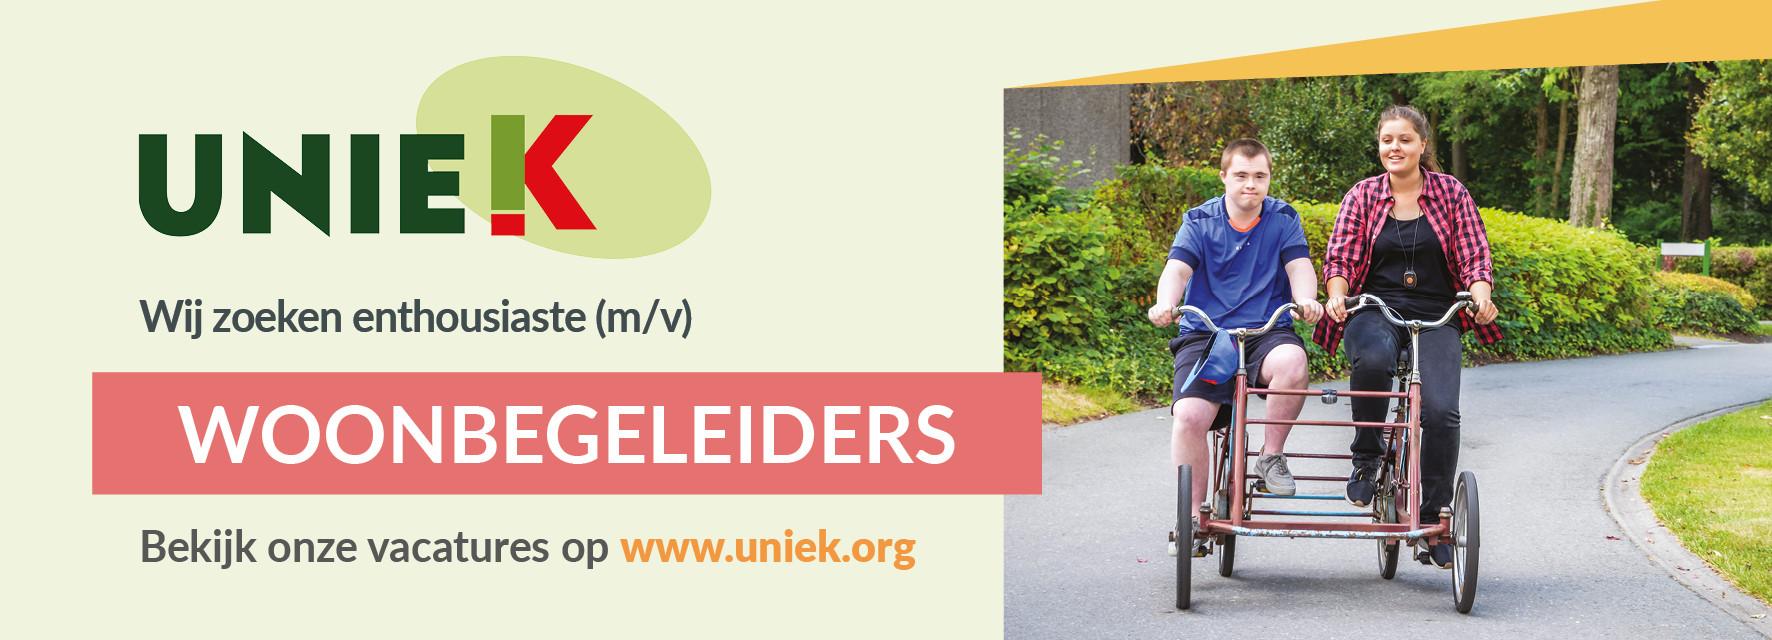 UNIEK_BUS_popup_site.jpg